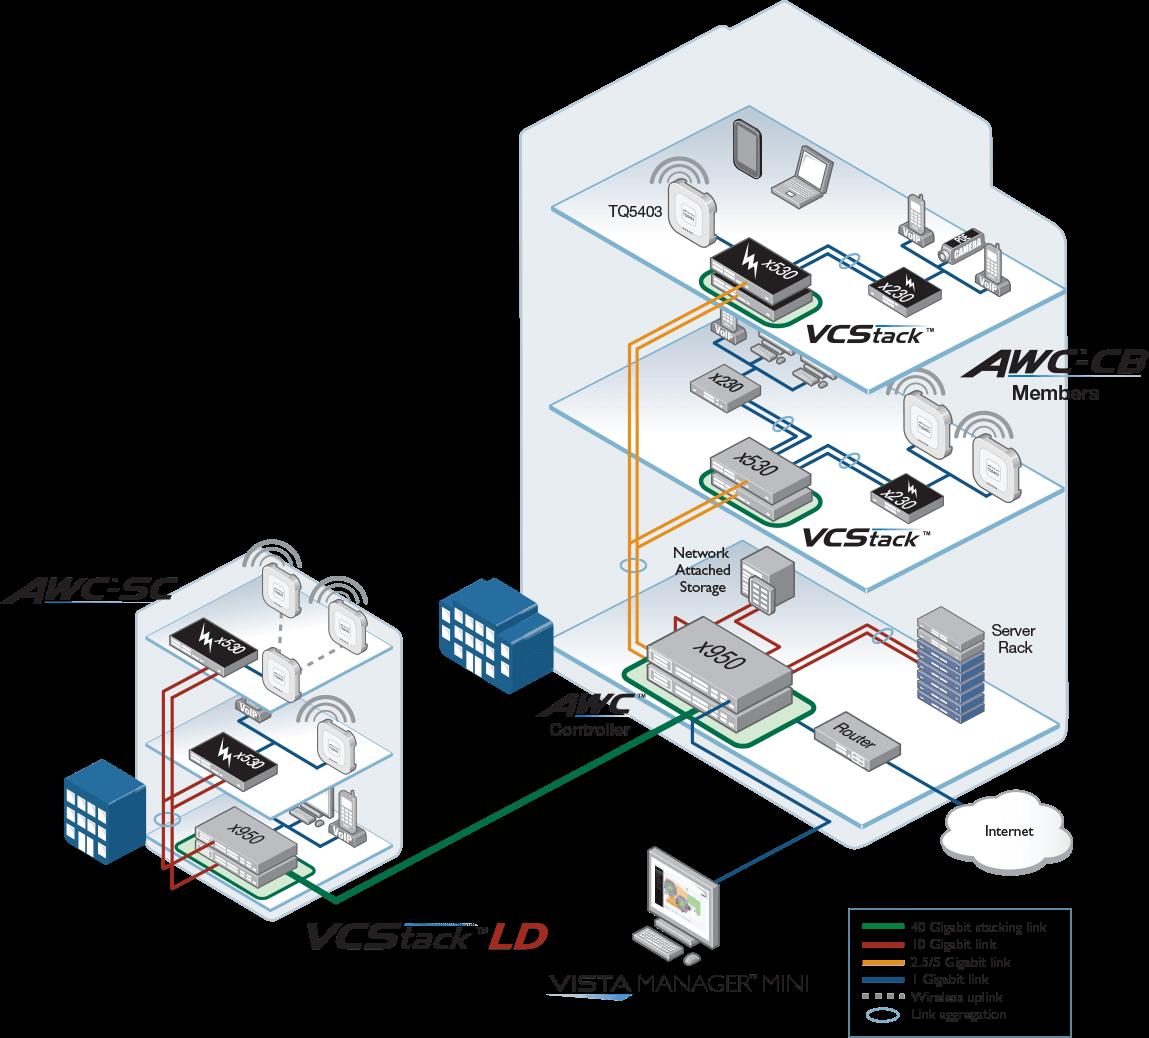 x950 Integrated Wireless LAN